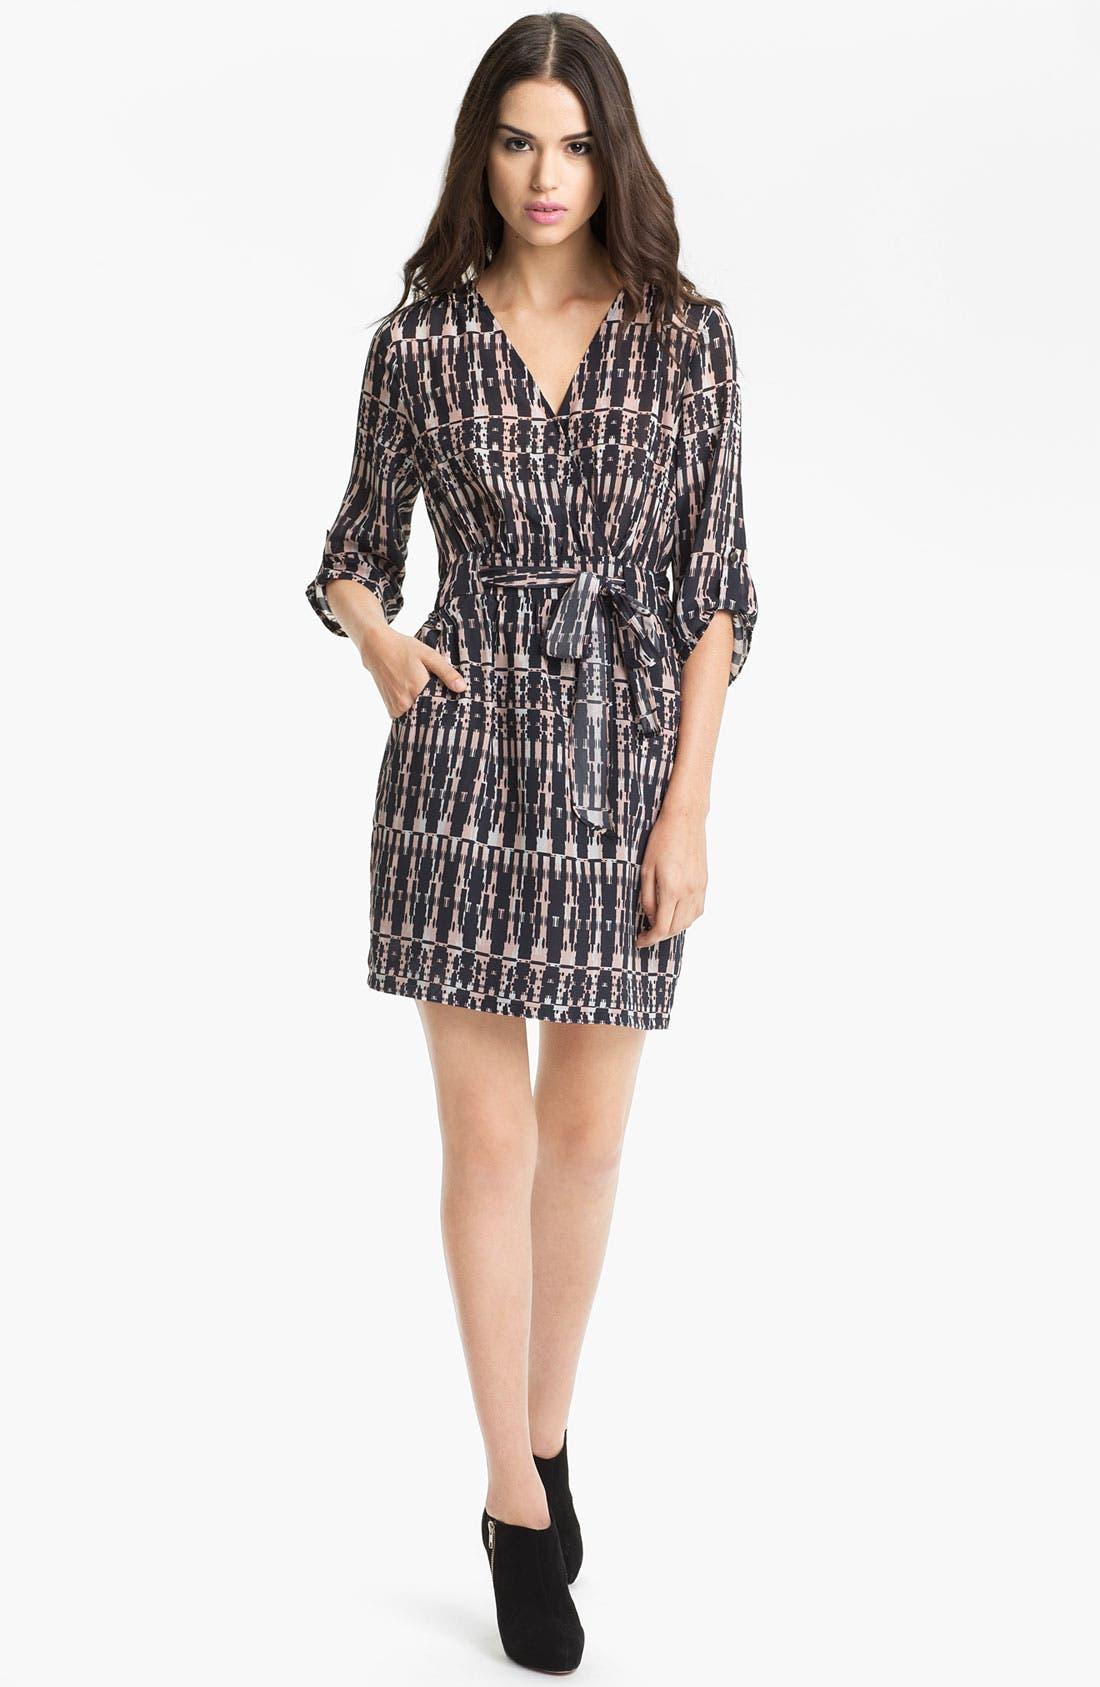 Main Image - Presley Skye 'Amy' Silk Faux Wrap Dress